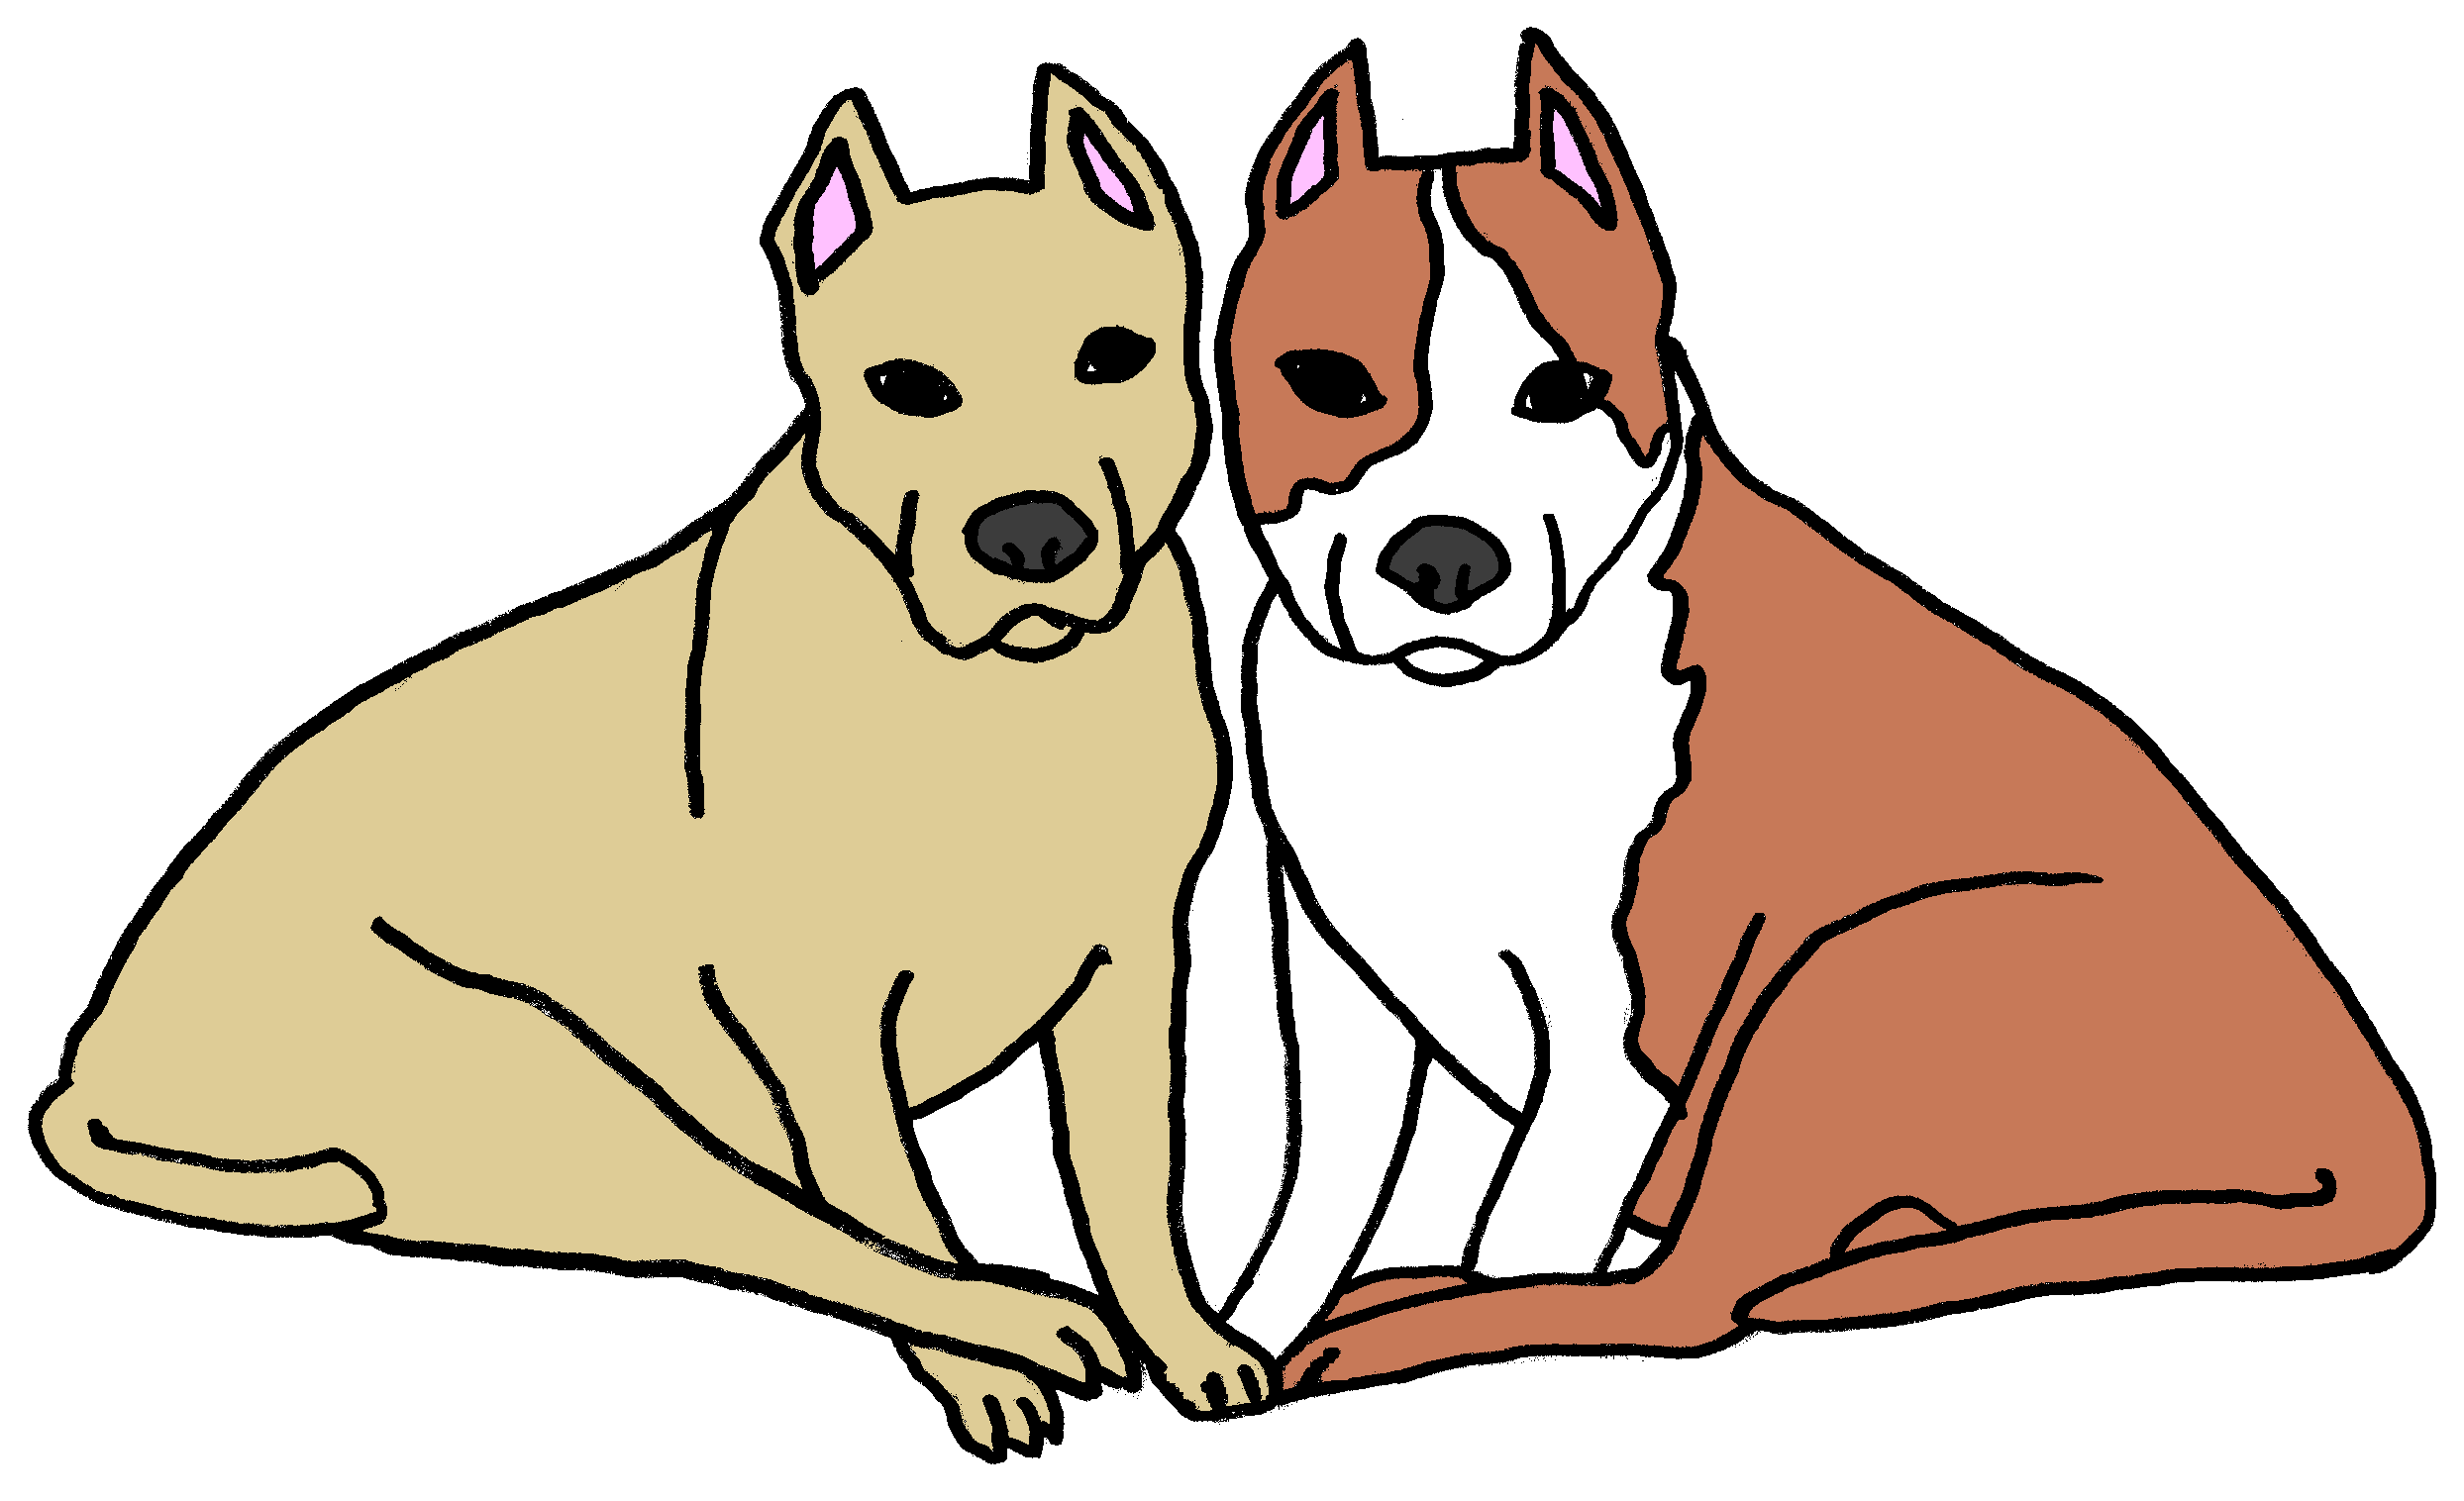 Pet clipart two dog Diabolical Do Pet Plots Cartooning!